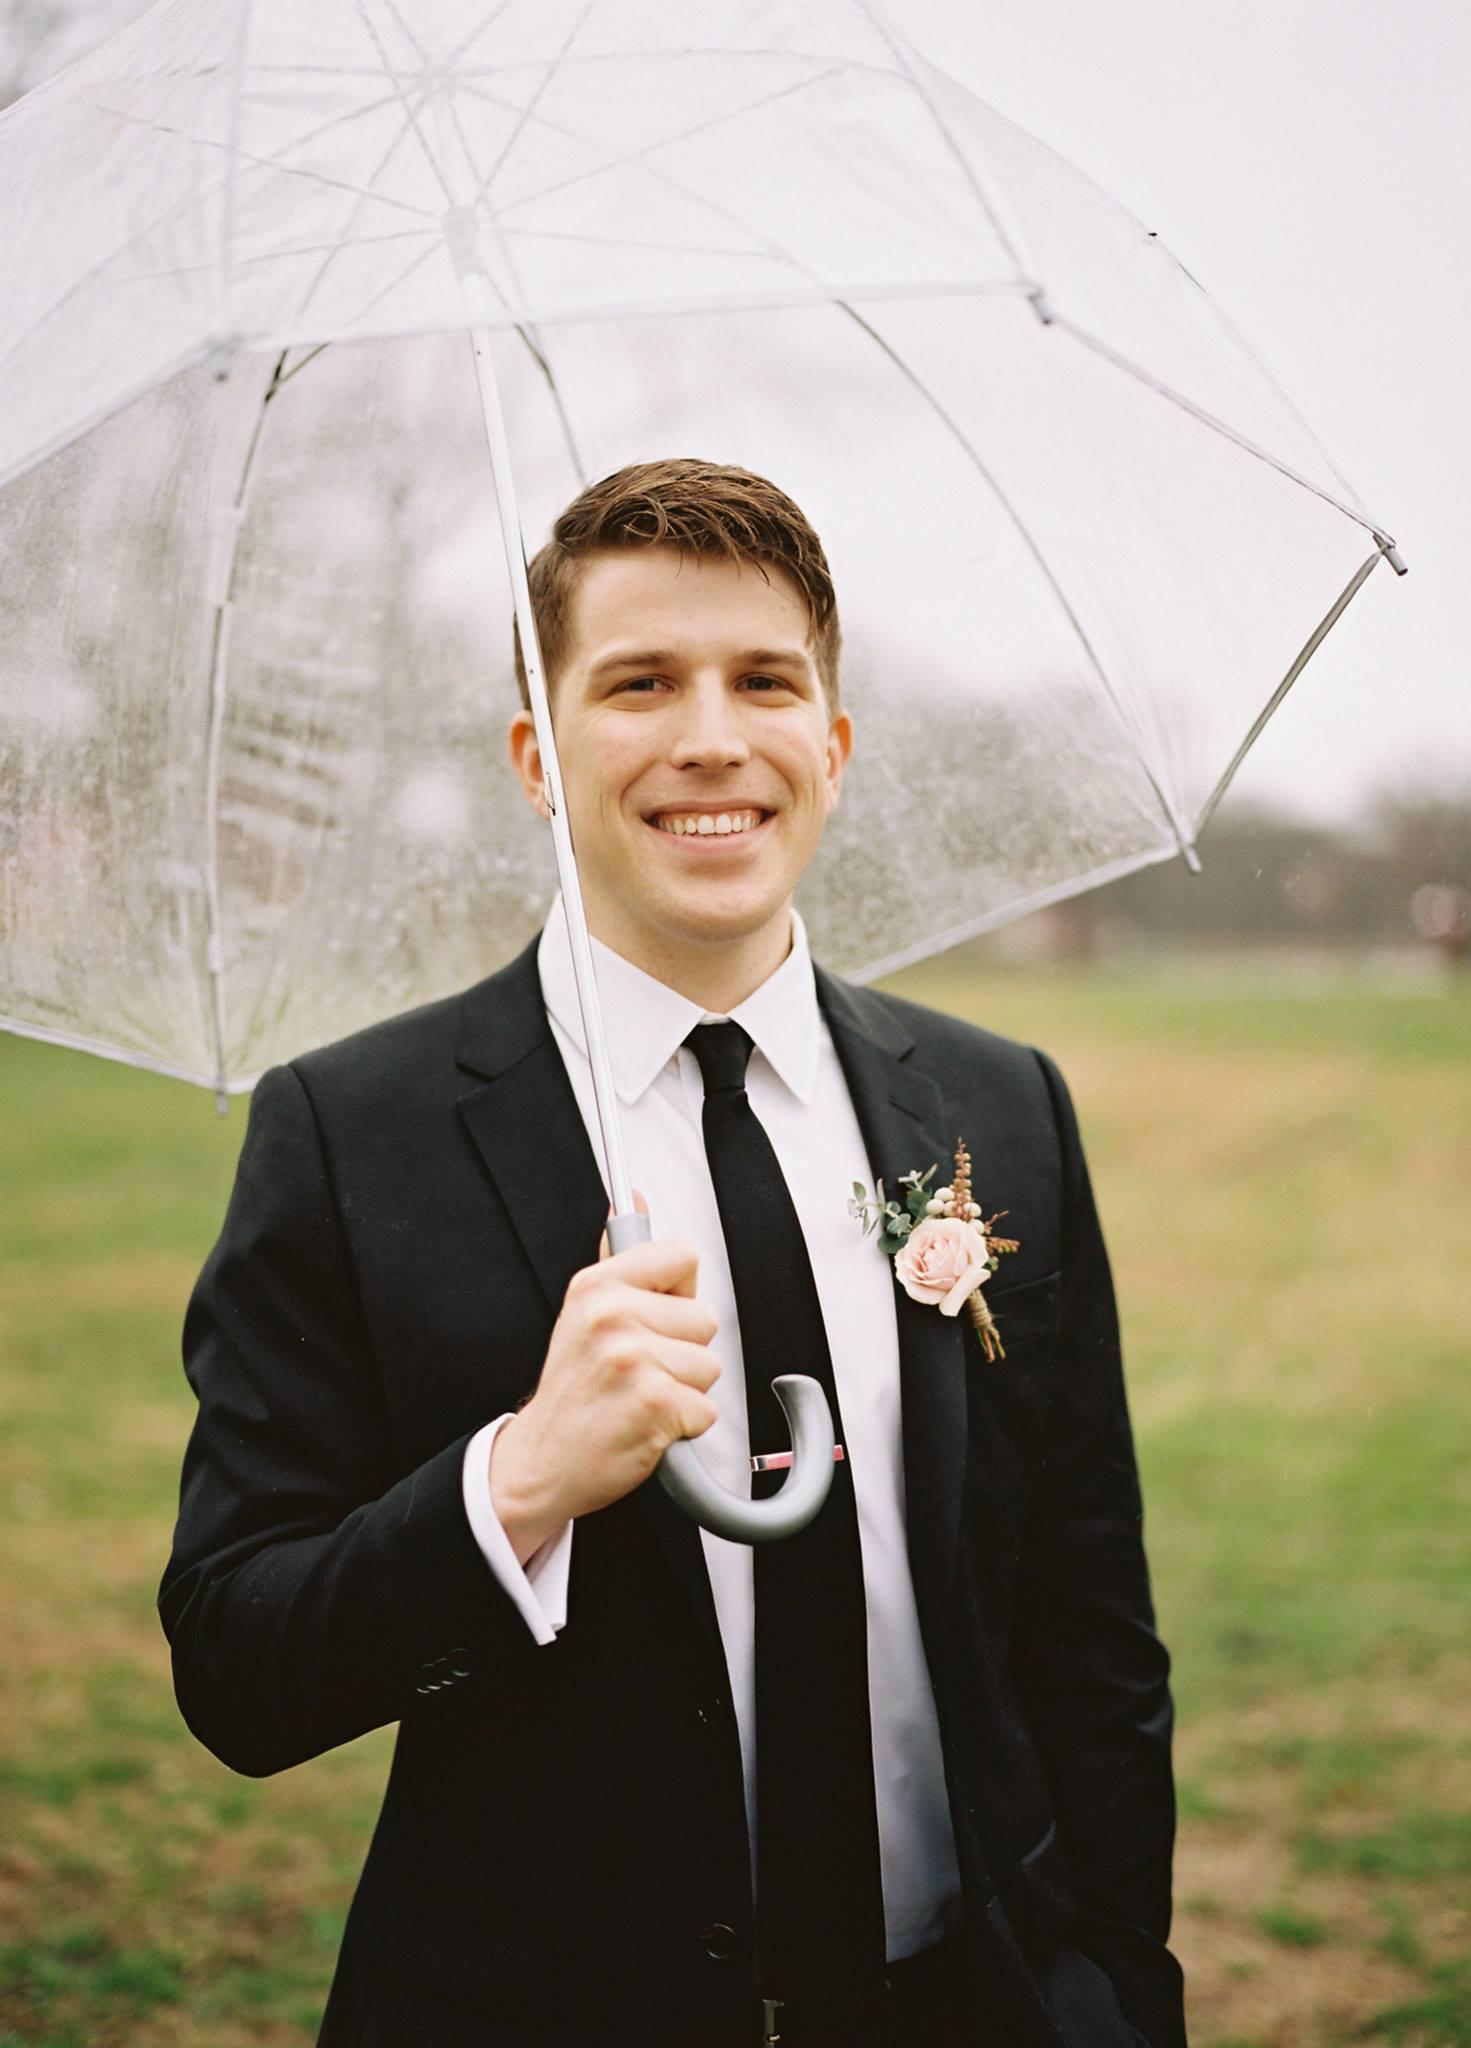 Rainy wedding day // Neutral groom boutonniere